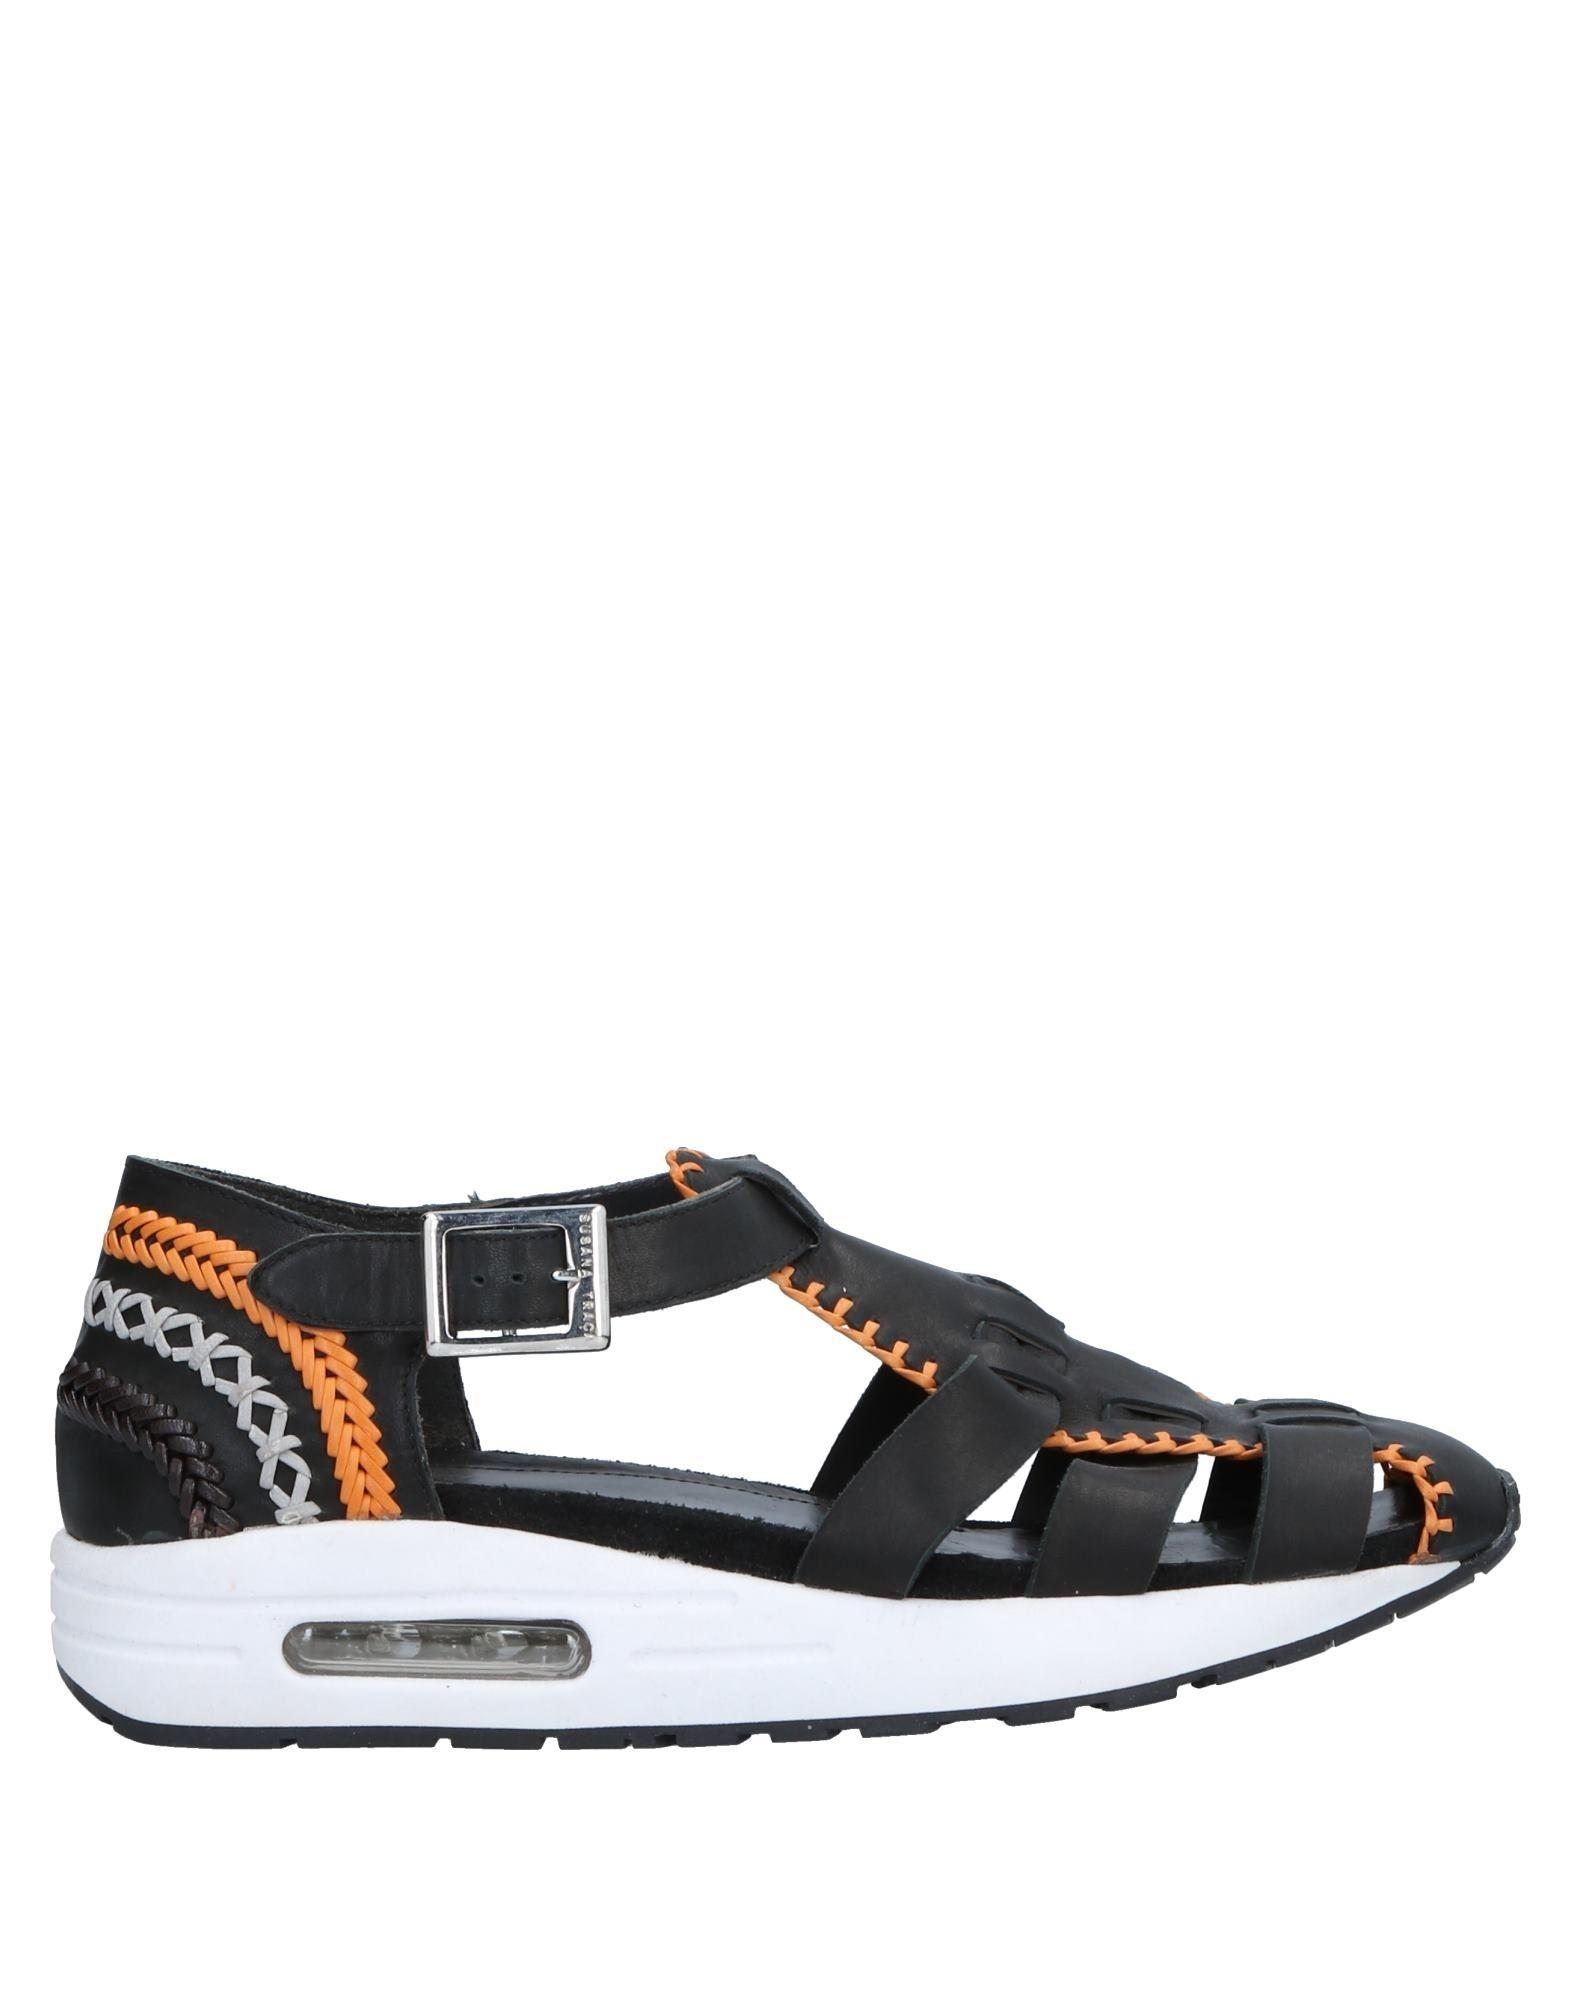 Stilvolle Susana billige Schuhe Susana Stilvolle Traca Sandalen Damen 11538543IM a61666